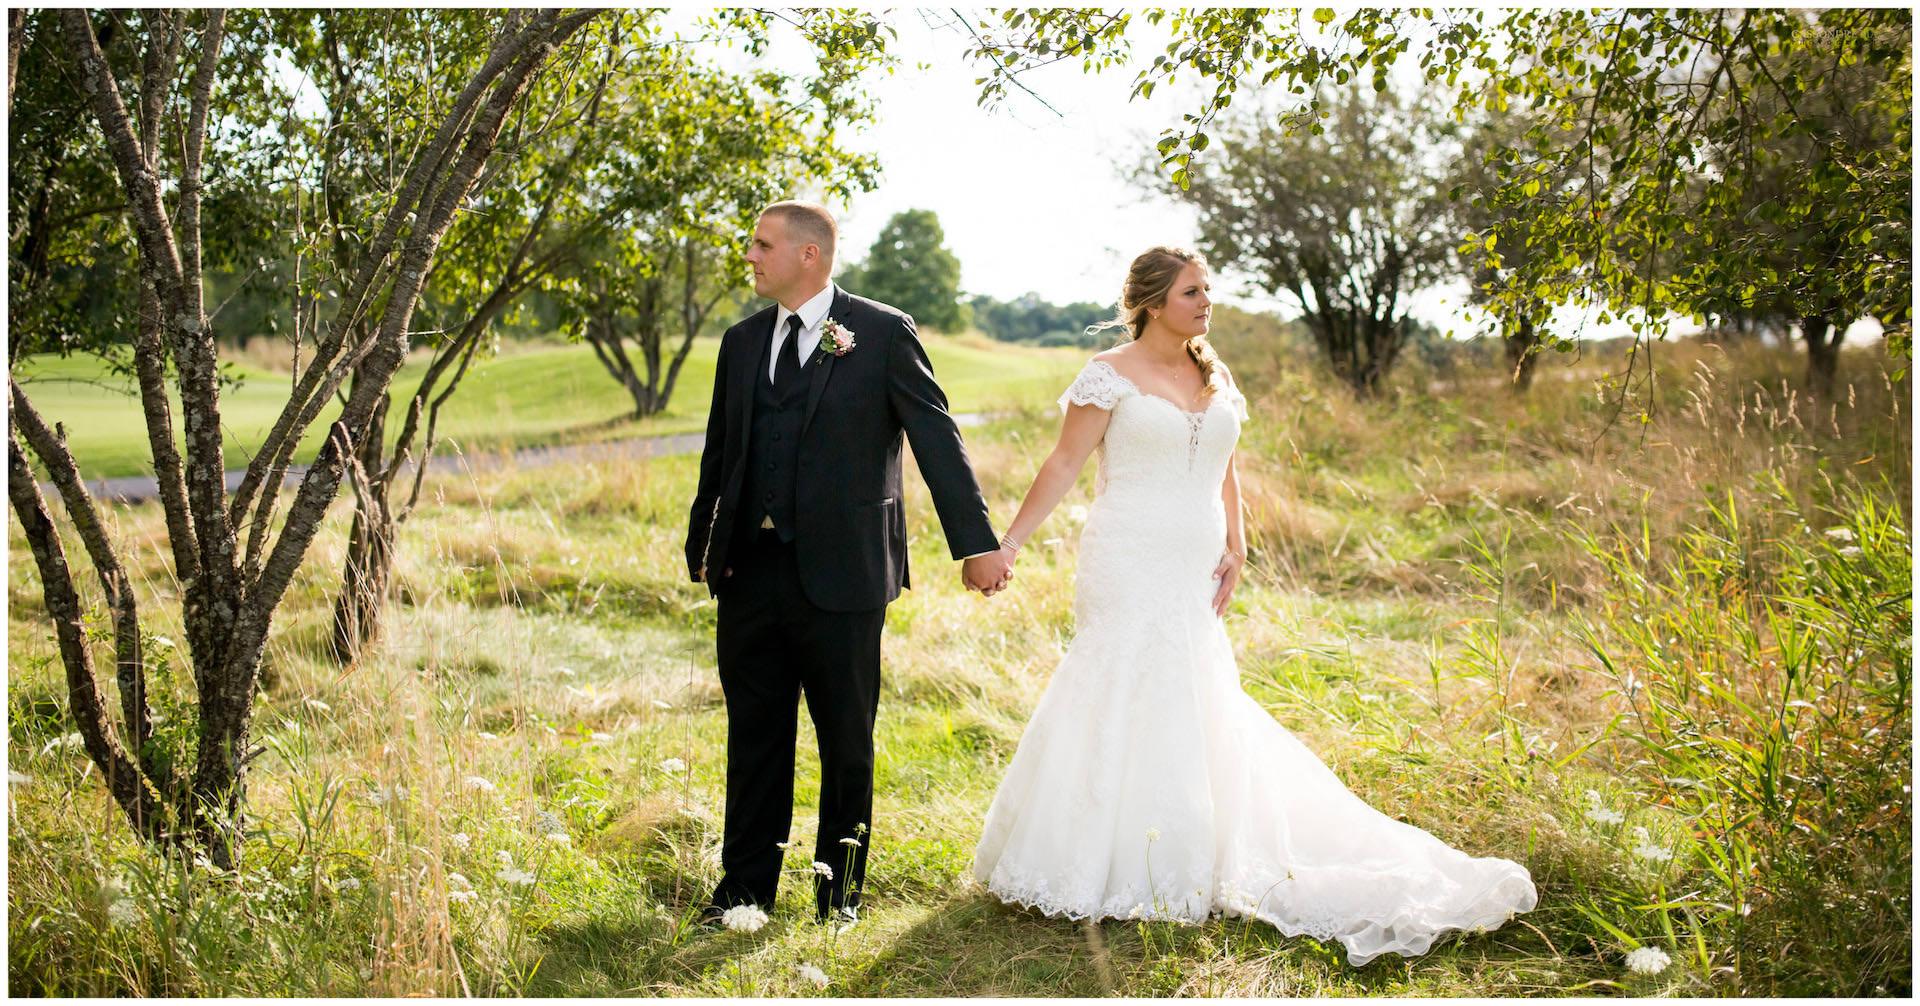 Cassondre Mae Photography Hudson Valley Wedding Photographer 3.jpg